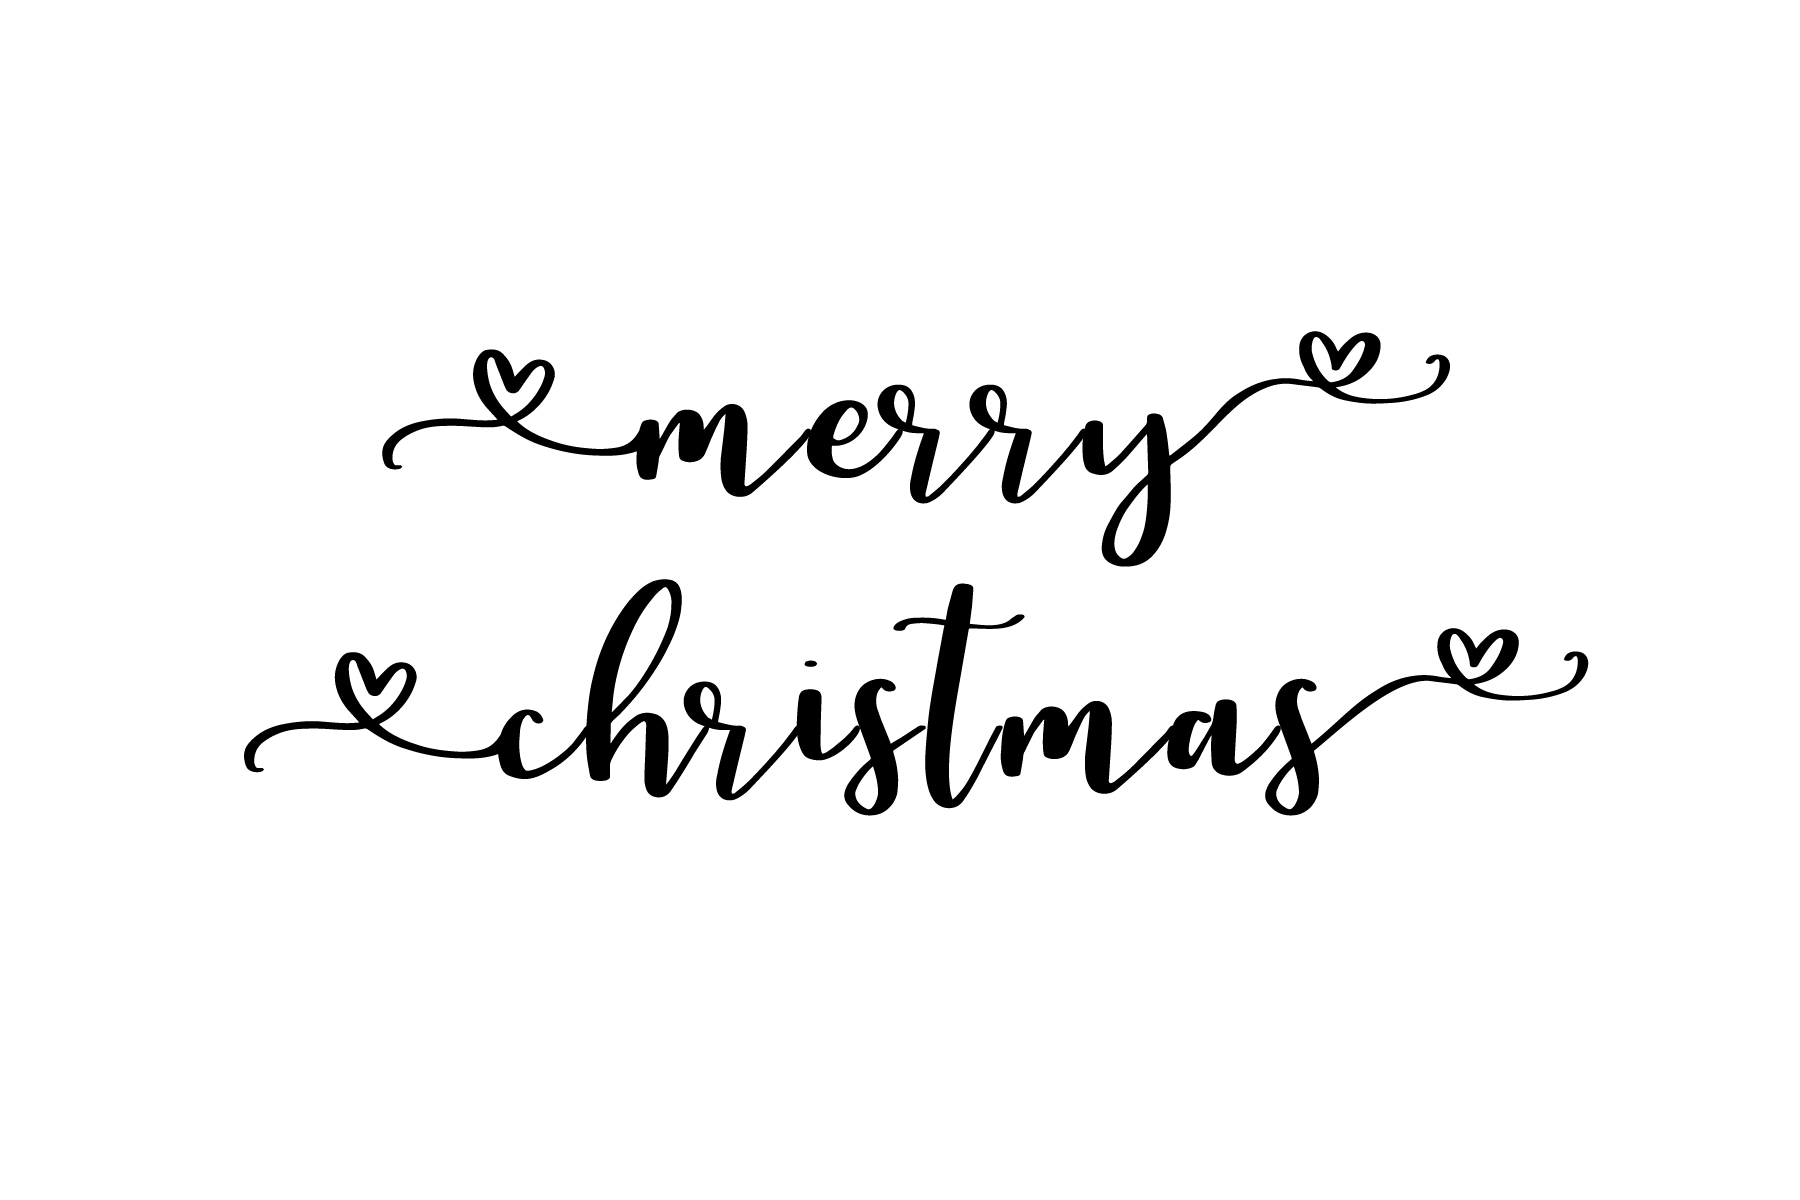 Christmas Sayings, Quotes, SVG Cut FIle, Mug, Tshirt Designs example image 2